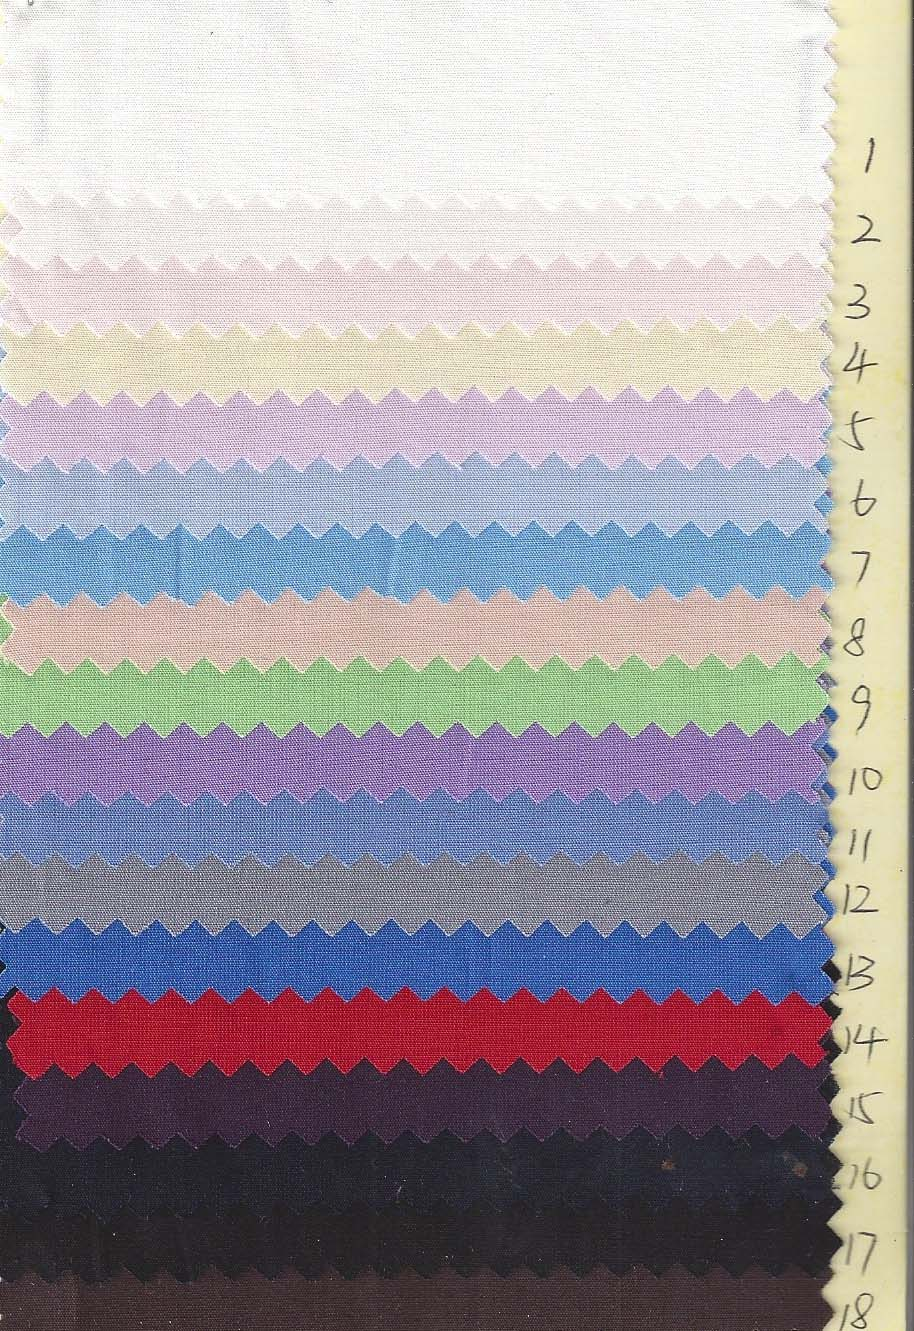 Hong Zhan Textile 283.jpg